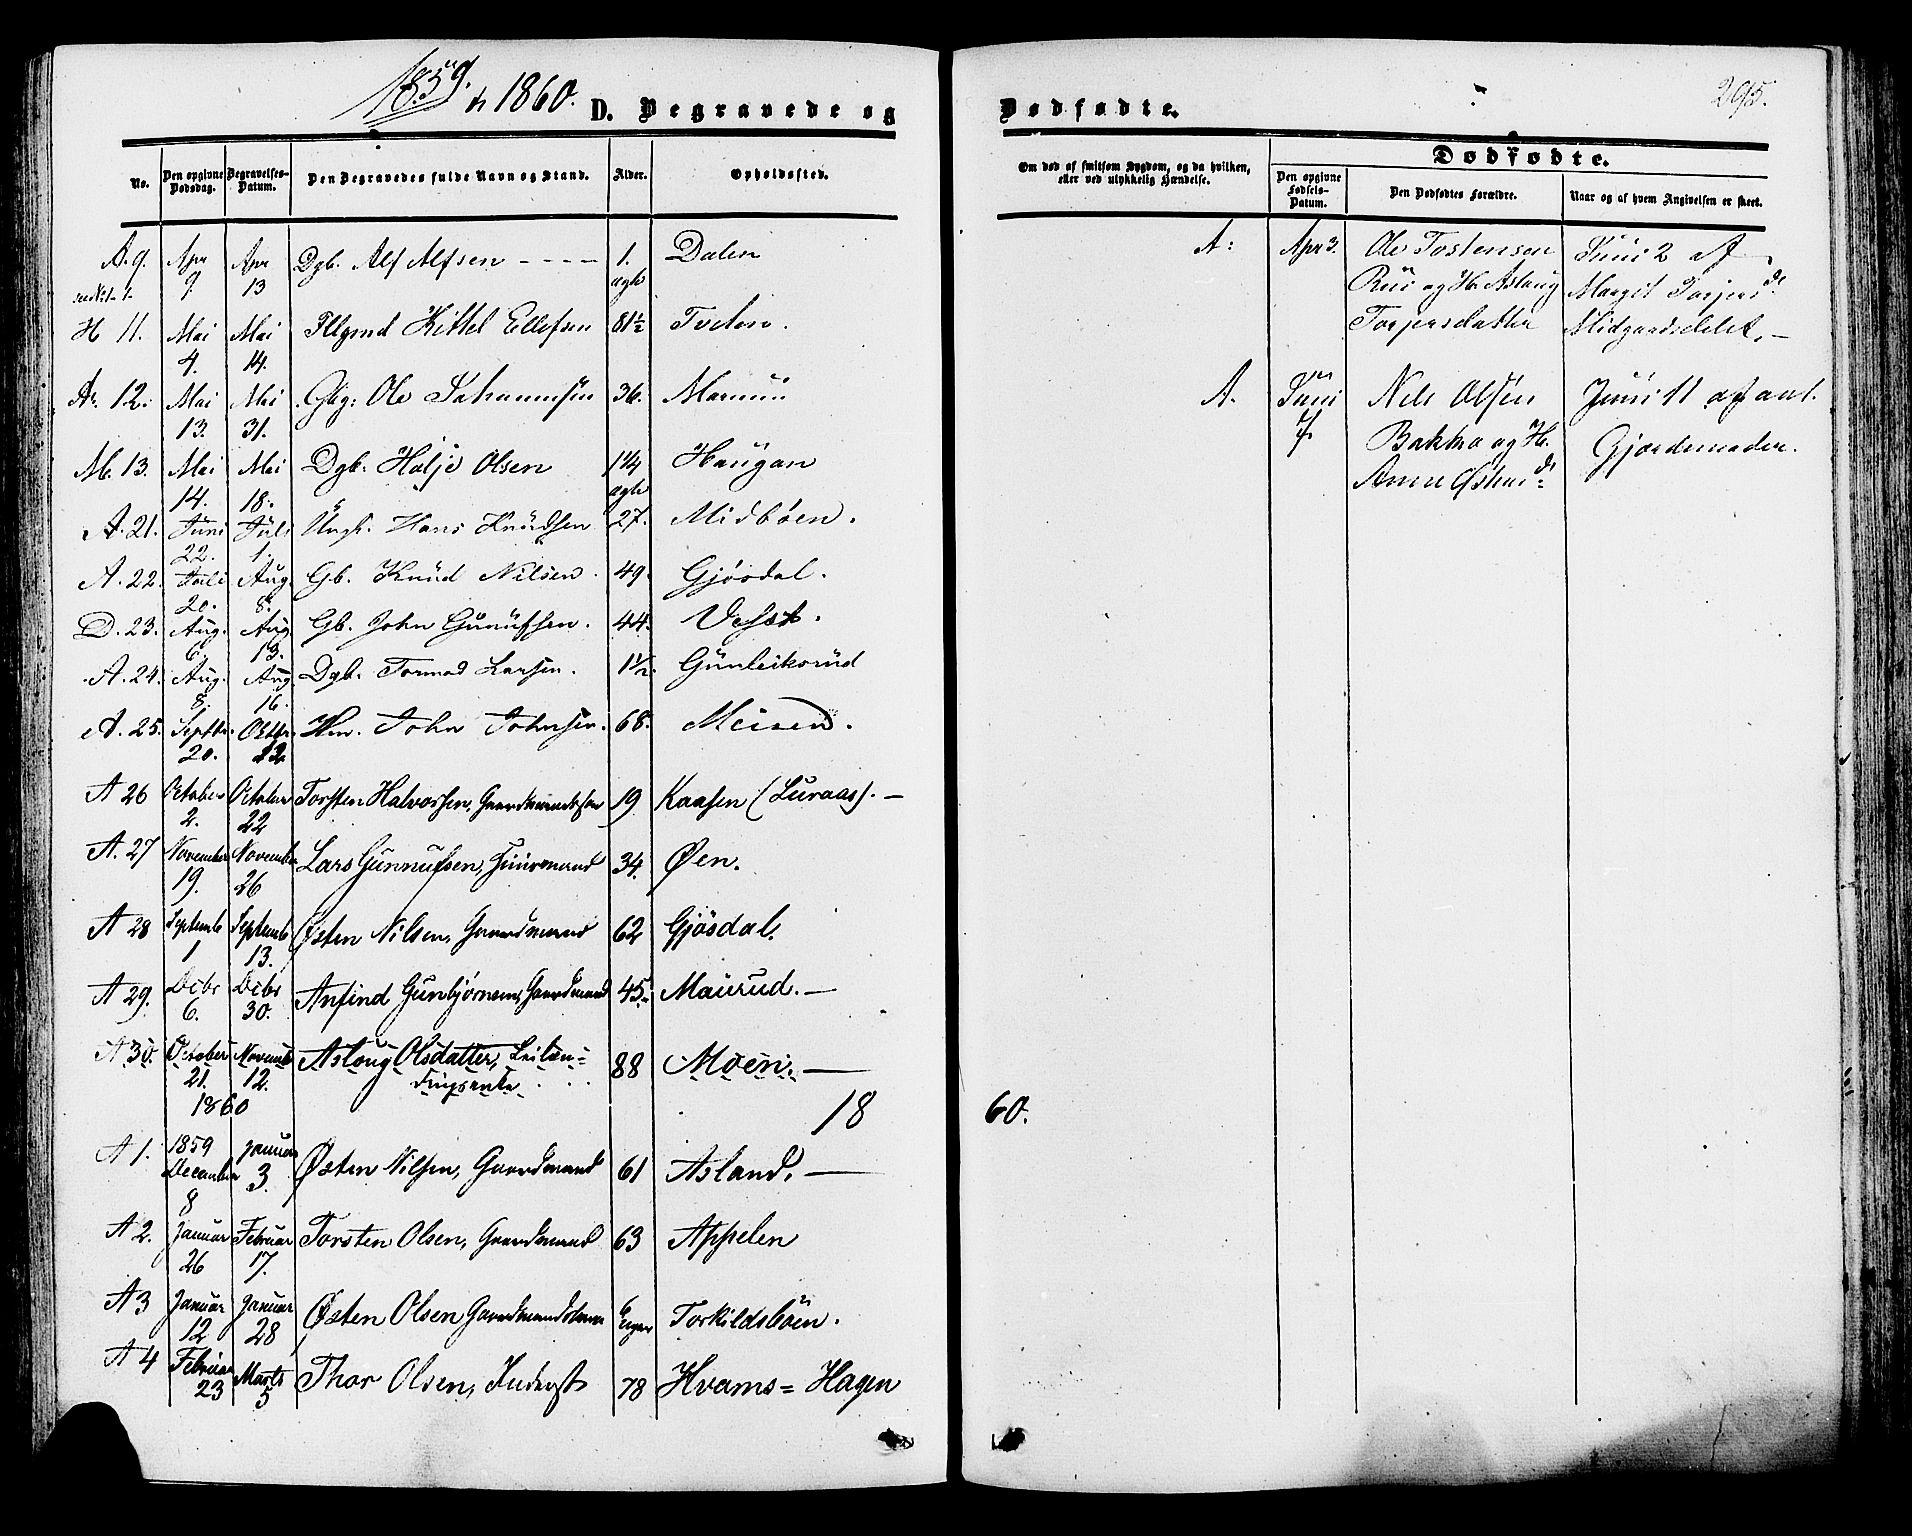 SAKO, Tinn kirkebøker, F/Fa/L0006: Ministerialbok nr. I 6, 1857-1878, s. 295